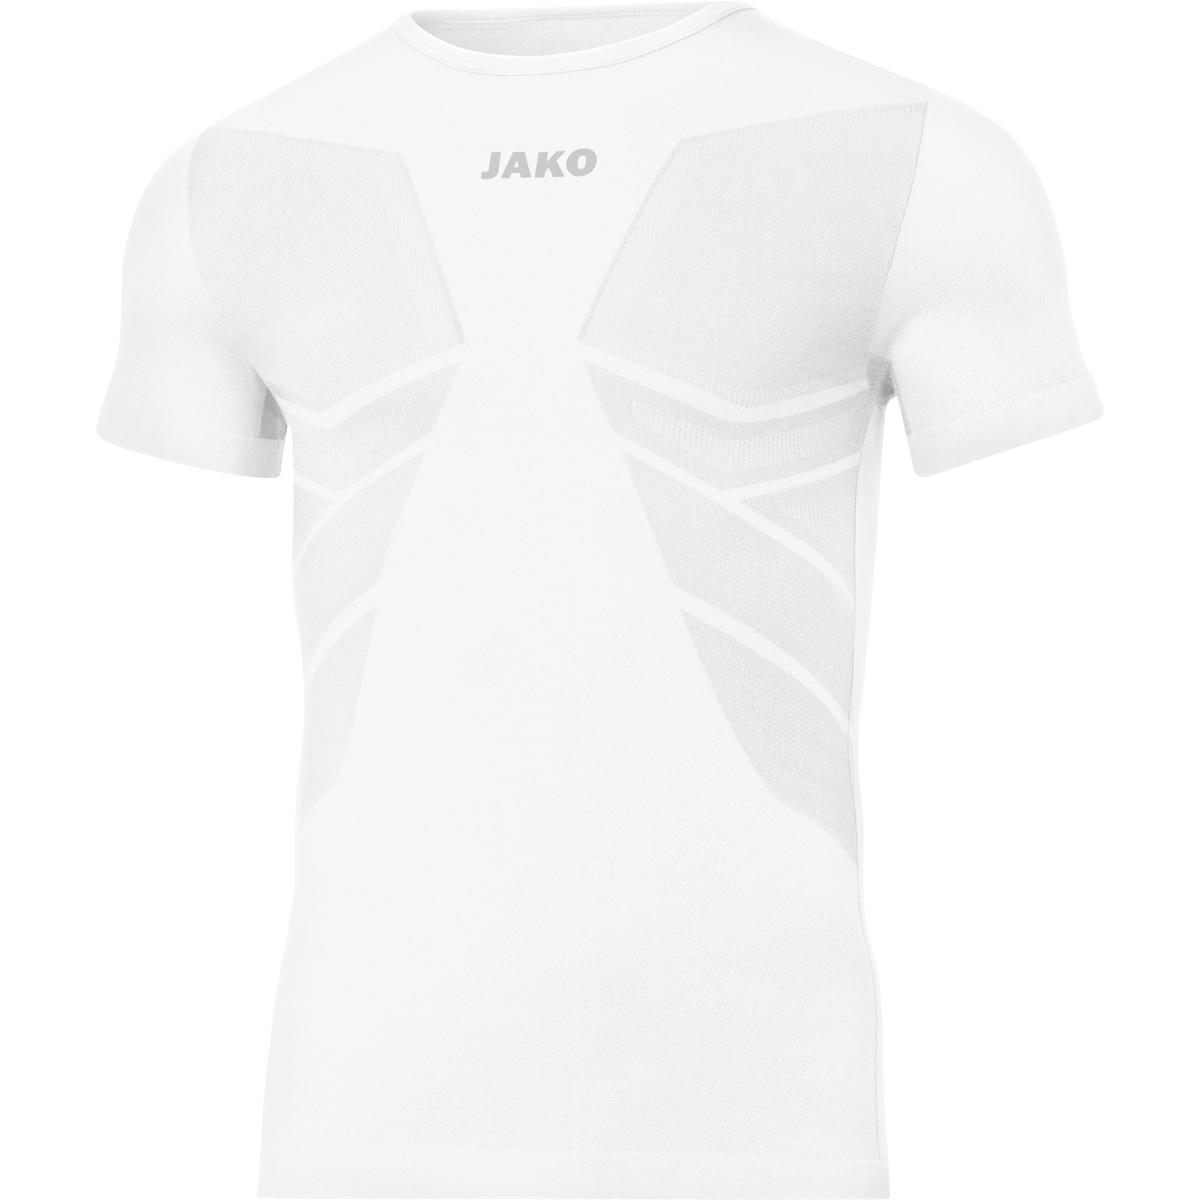 JAKO T-Shirt Comfort 2.0